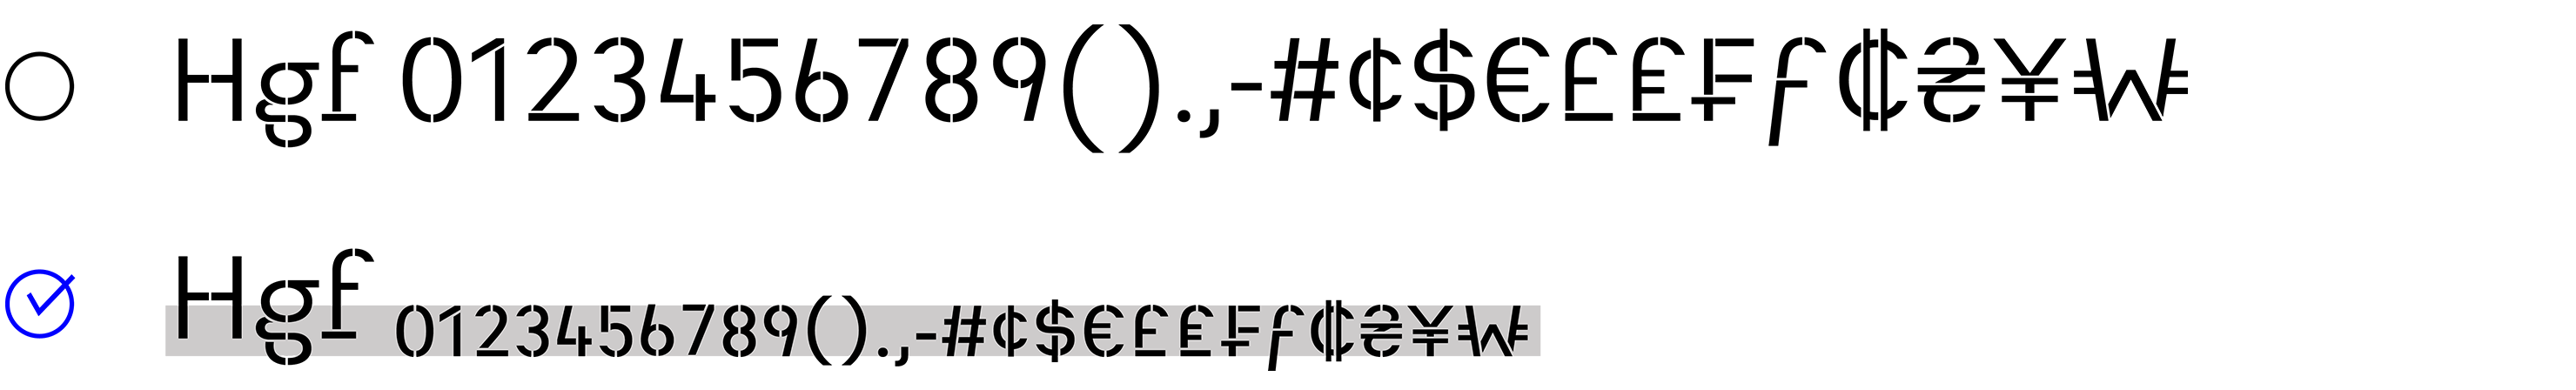 Typeface-Heimat-Stencil-F13-Atlas-Font-Foundry